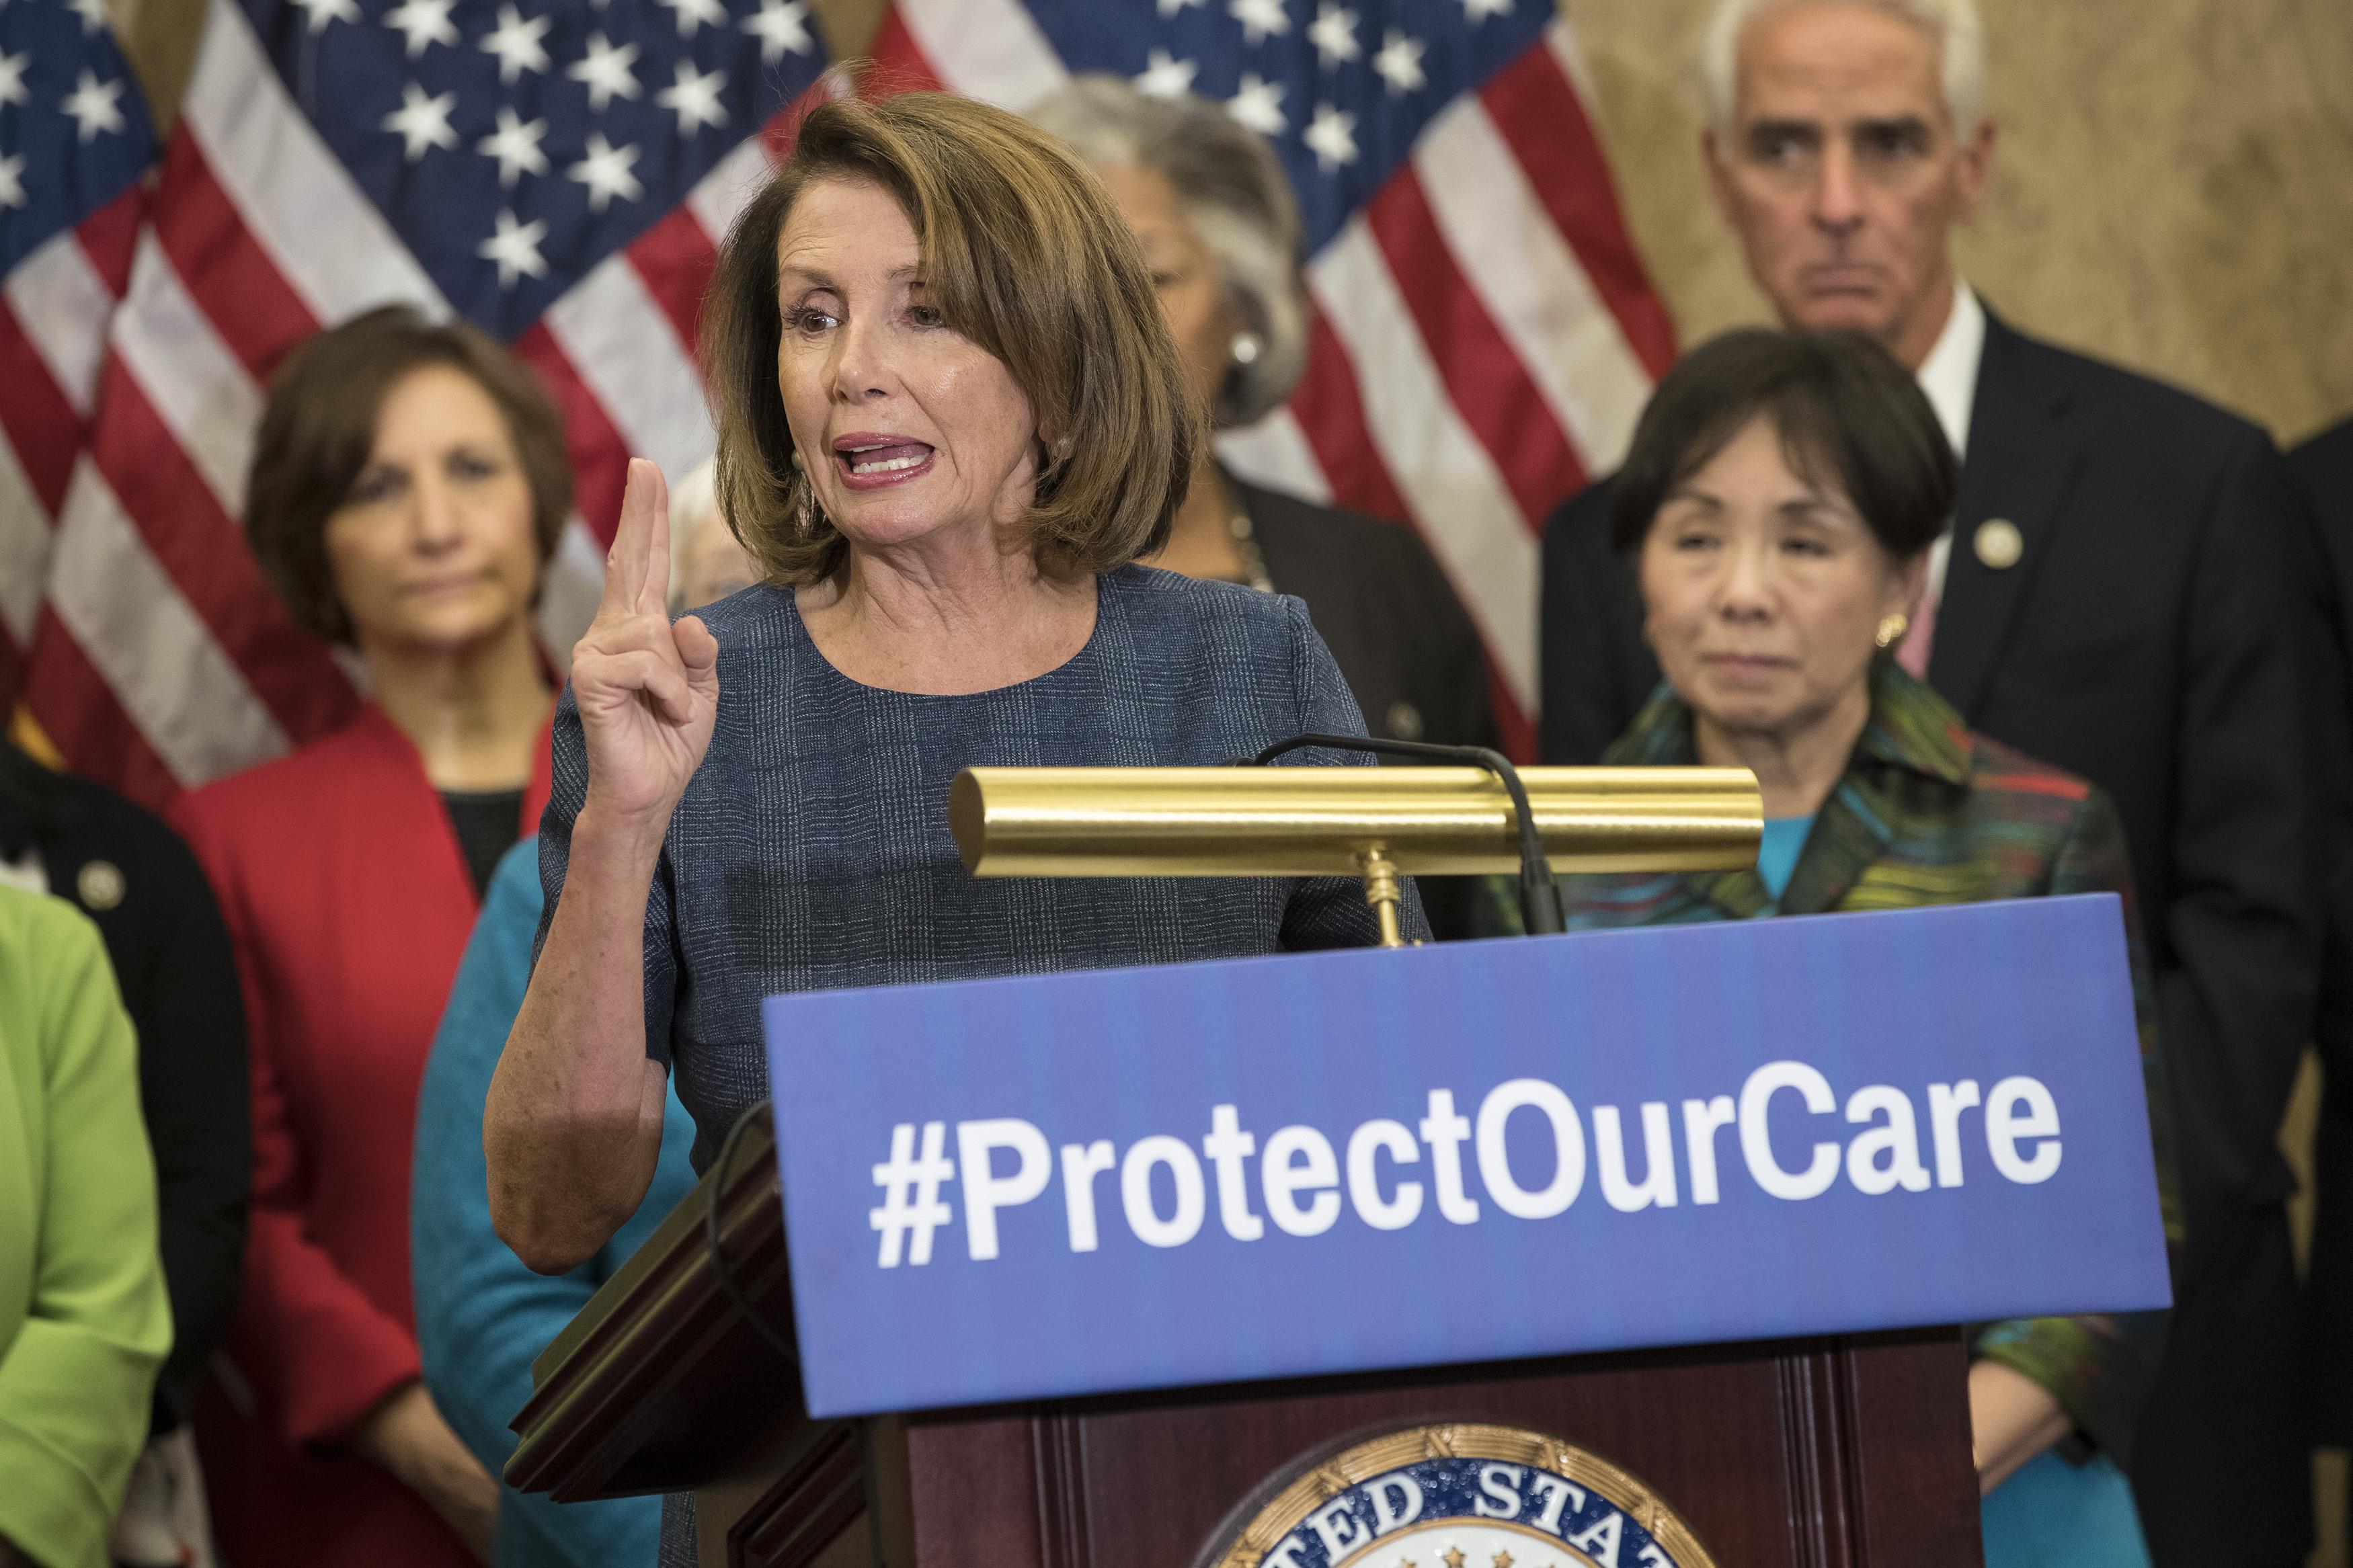 Nancy Pelosi Democratic Reps Discuss Harm Caused By Repealing ACA